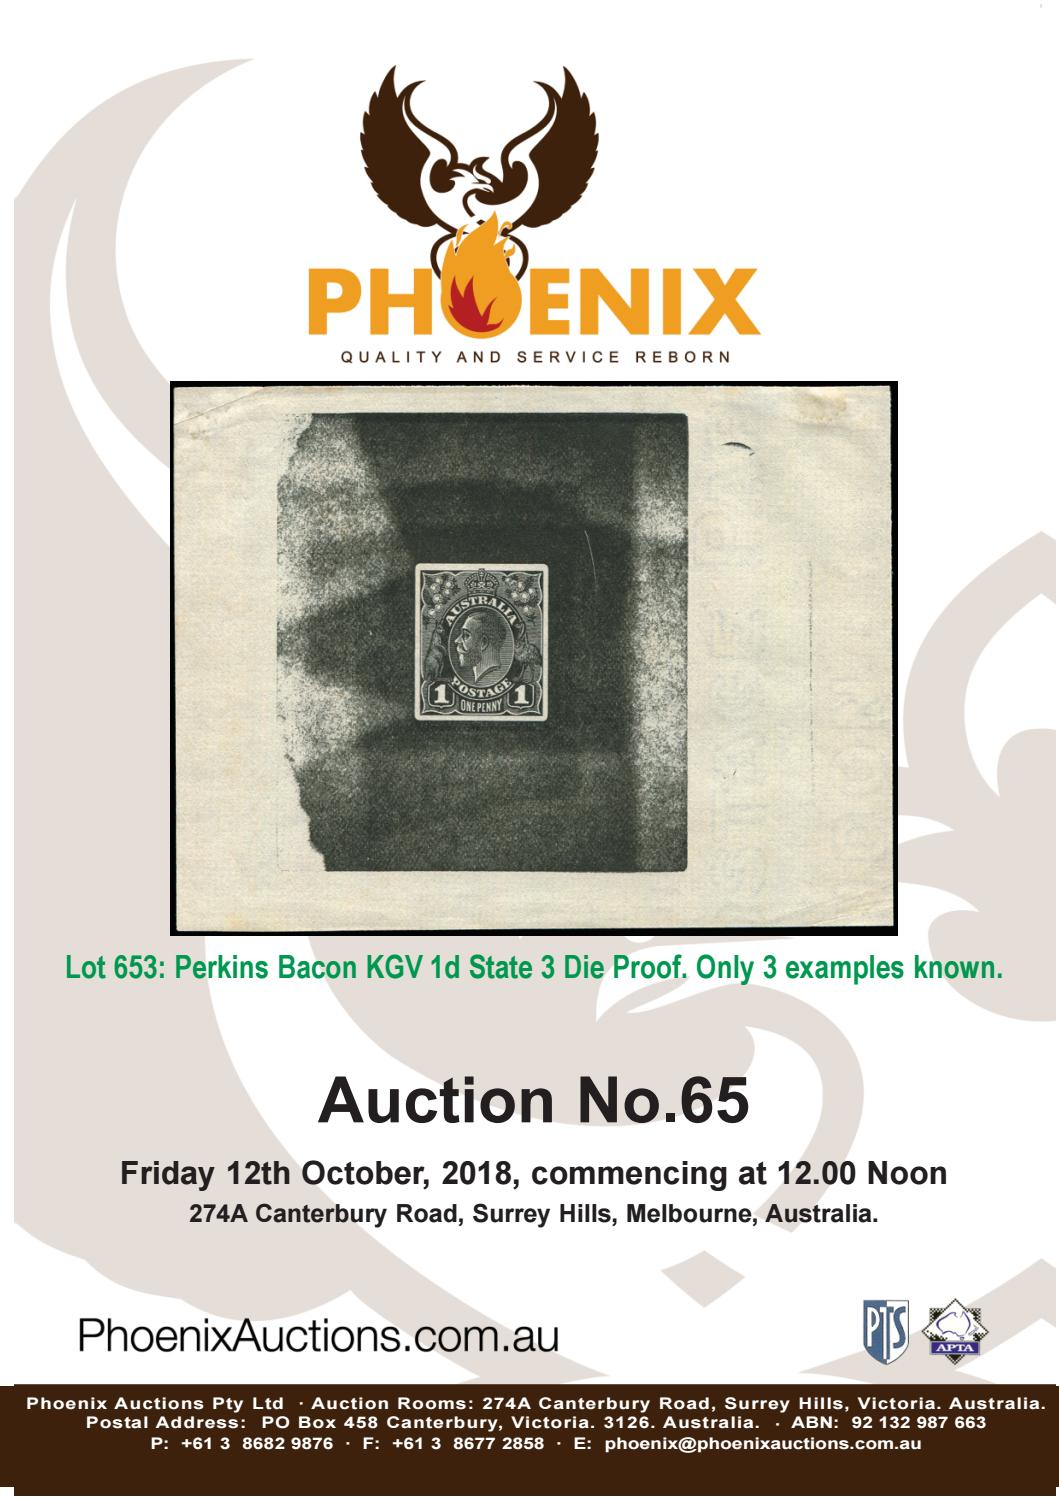 Phoenix Auction 65 by Phoenix Auctions Pty Ltd - issuu